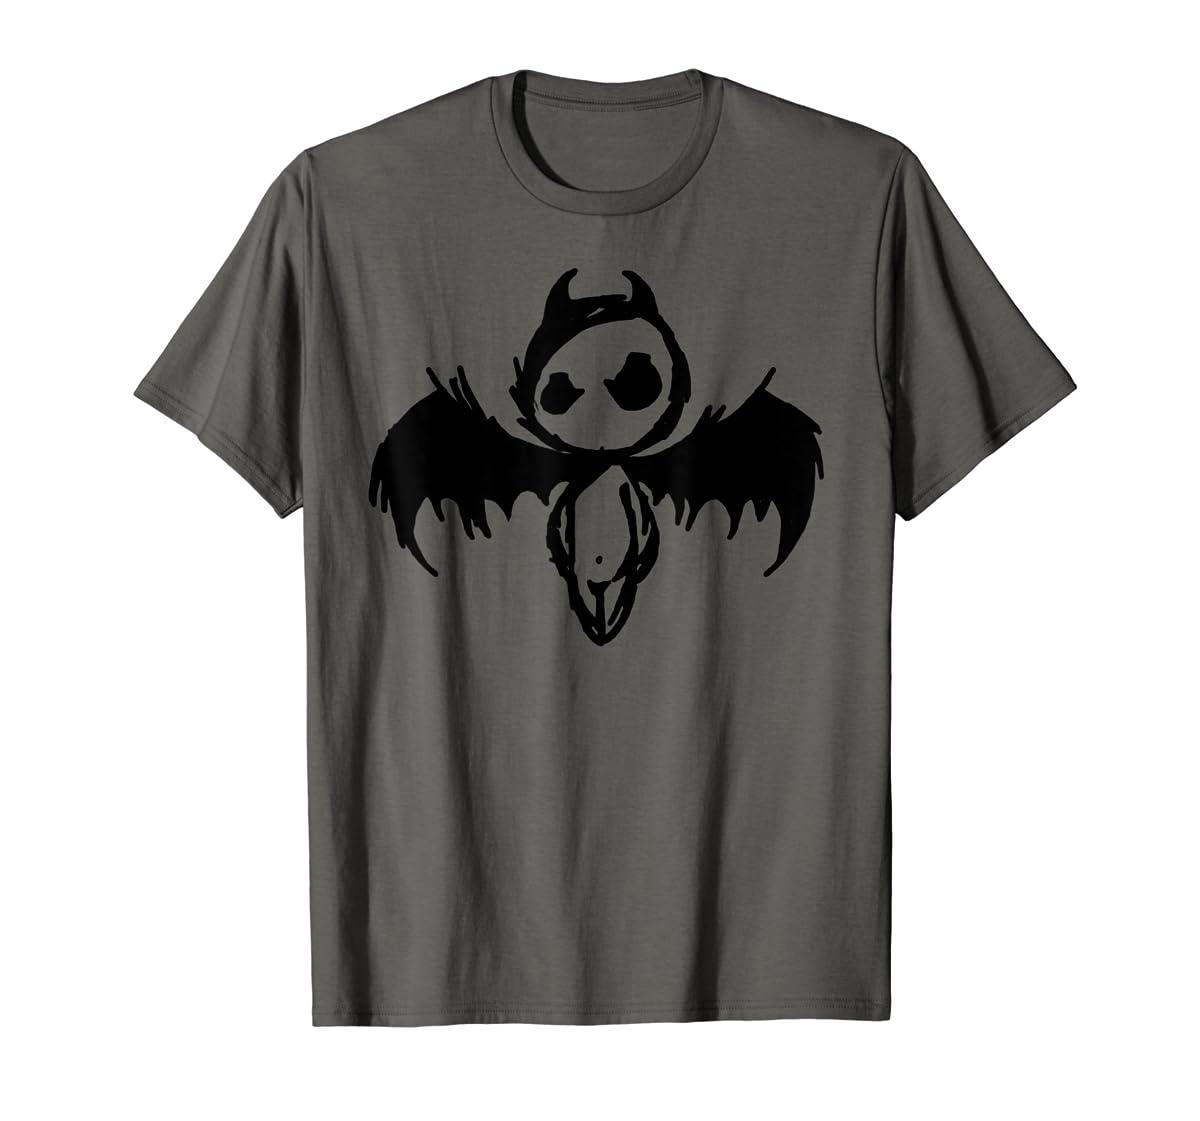 Cute Demon Vintage Couple Matching Halloween Party Costume  T-Shirt-Men's T-Shirt-Dark Heather